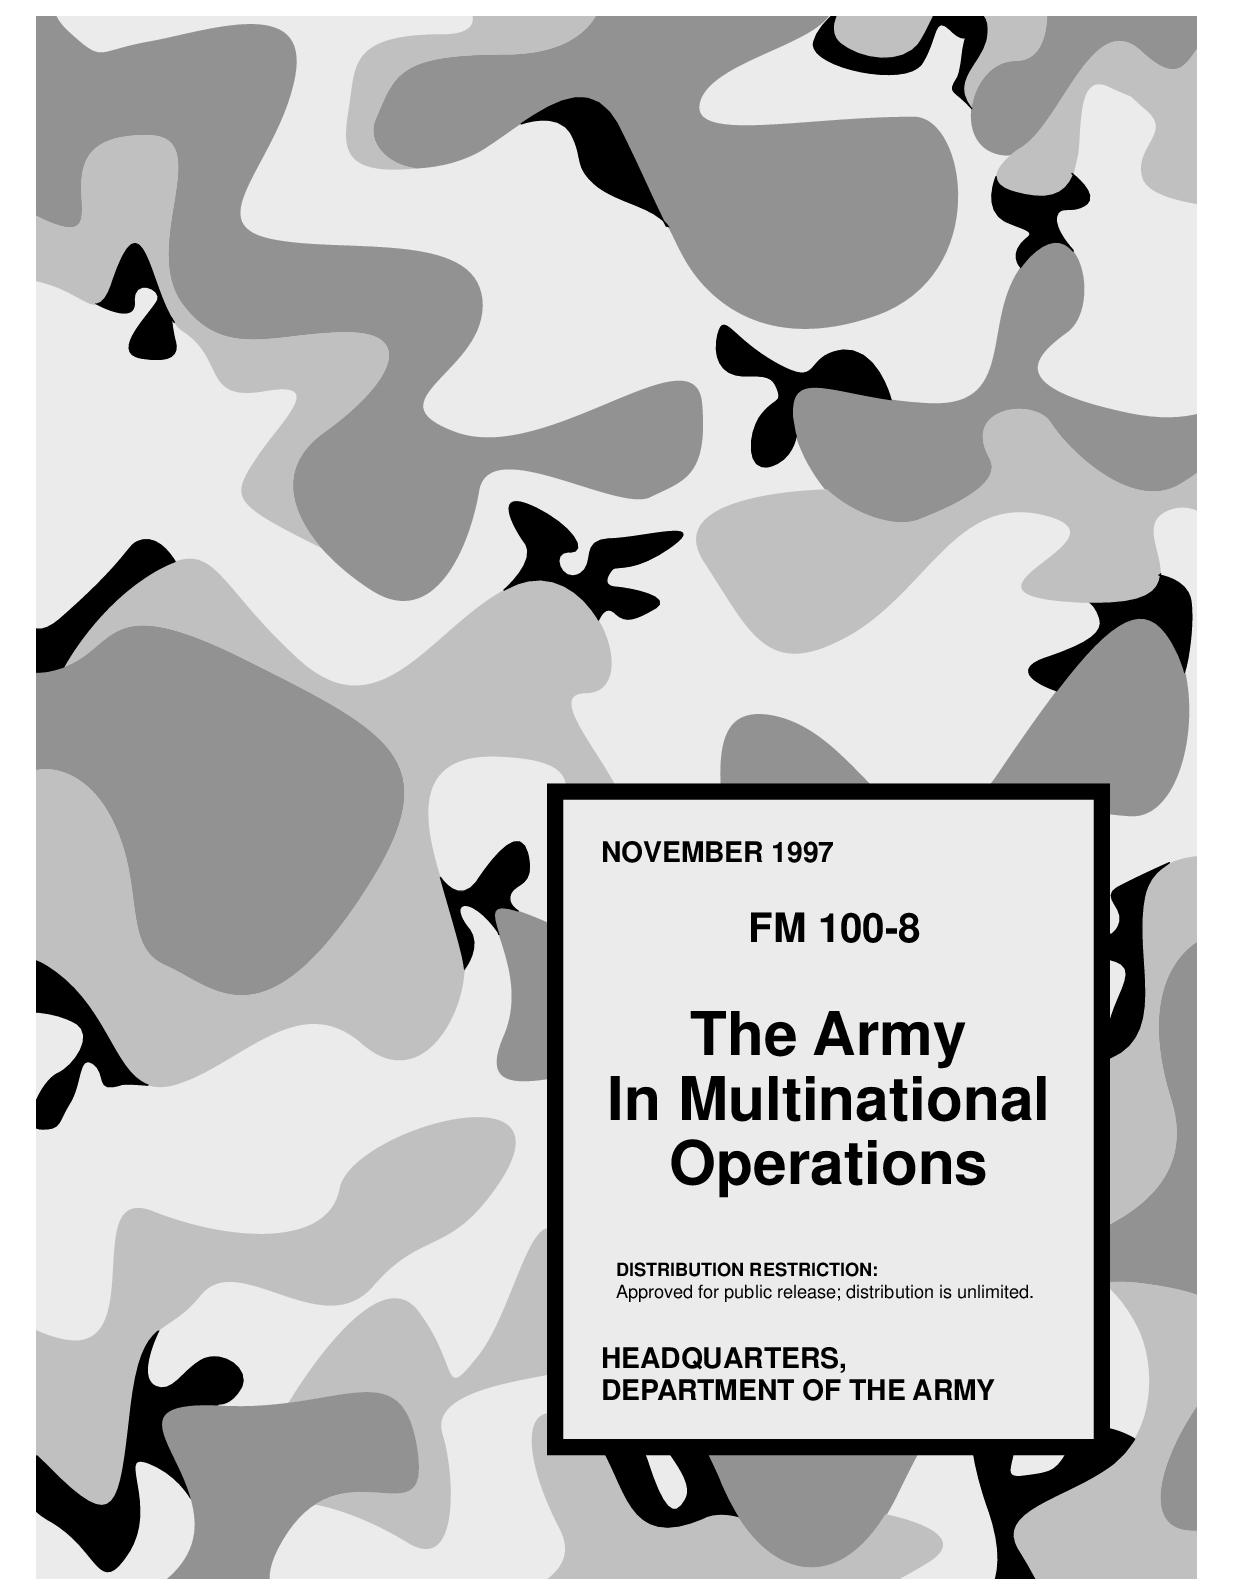 Calaméo - (e Book - English - Military) US Army - Field Manual FM